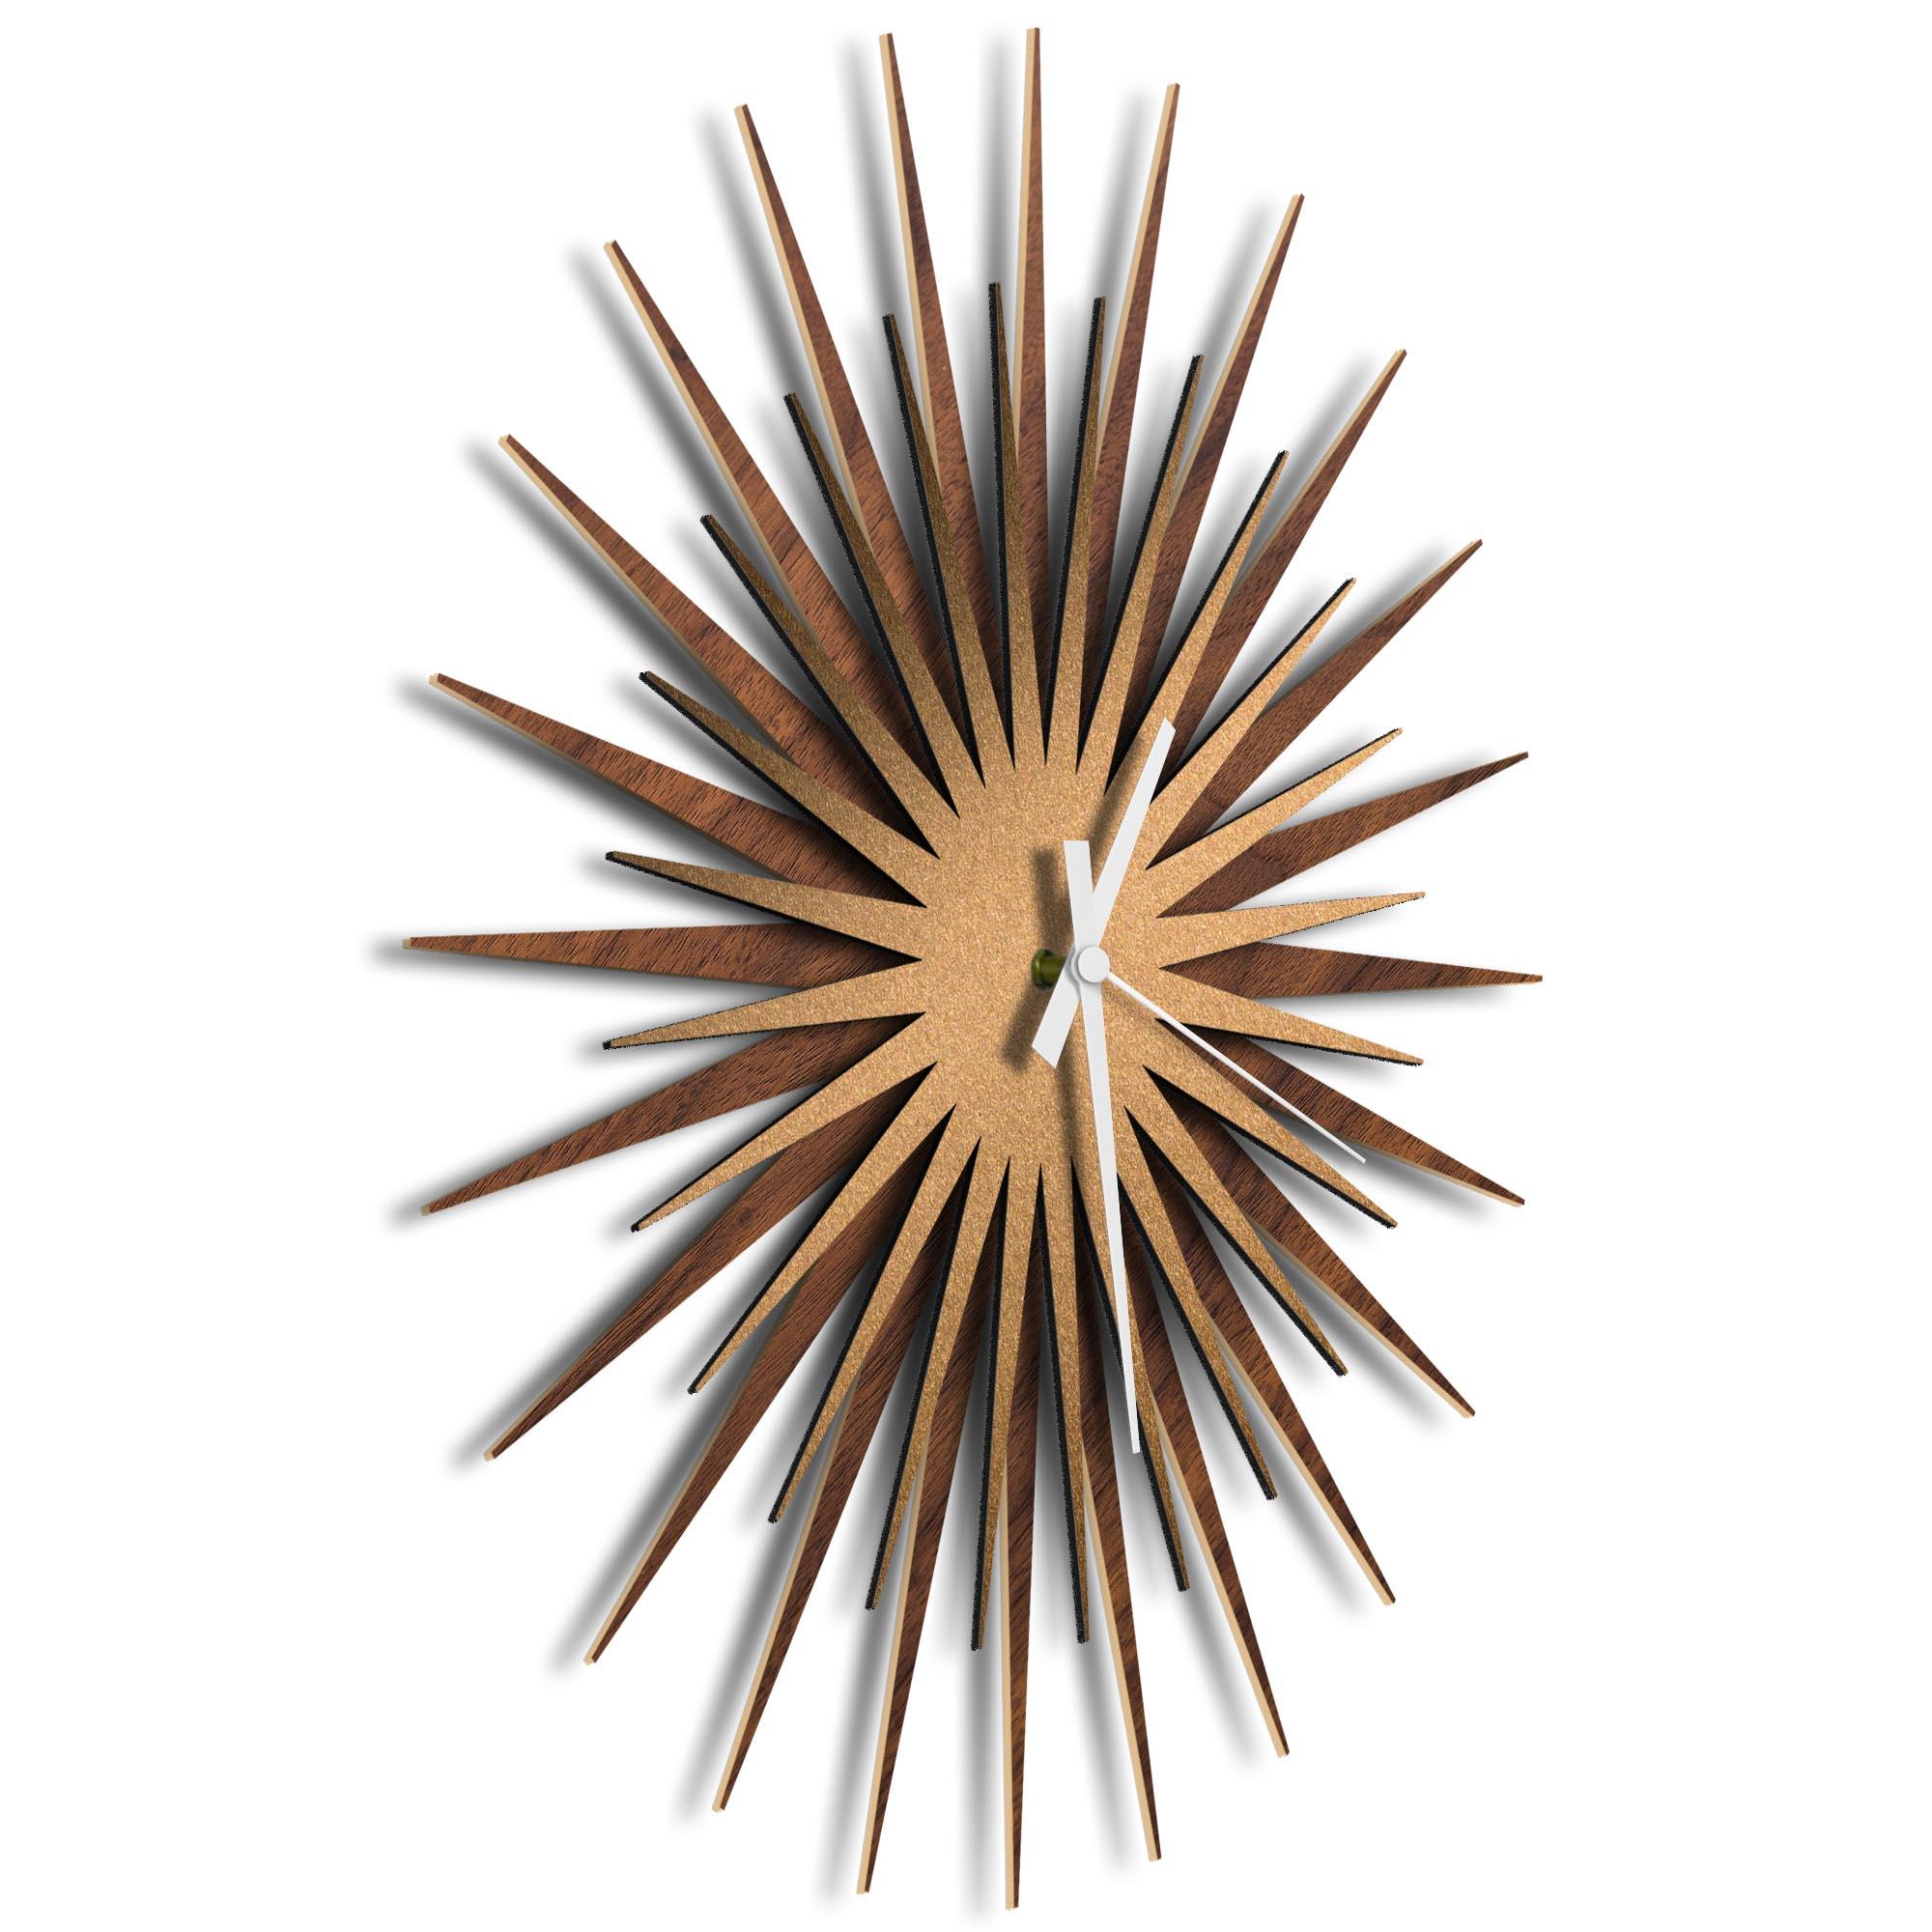 Atomic Era Clock Walnut Bronze White by Adam Schwoeppe - Mid-Century Modern Clock on Brushed Walnut Polymetal - Image 2